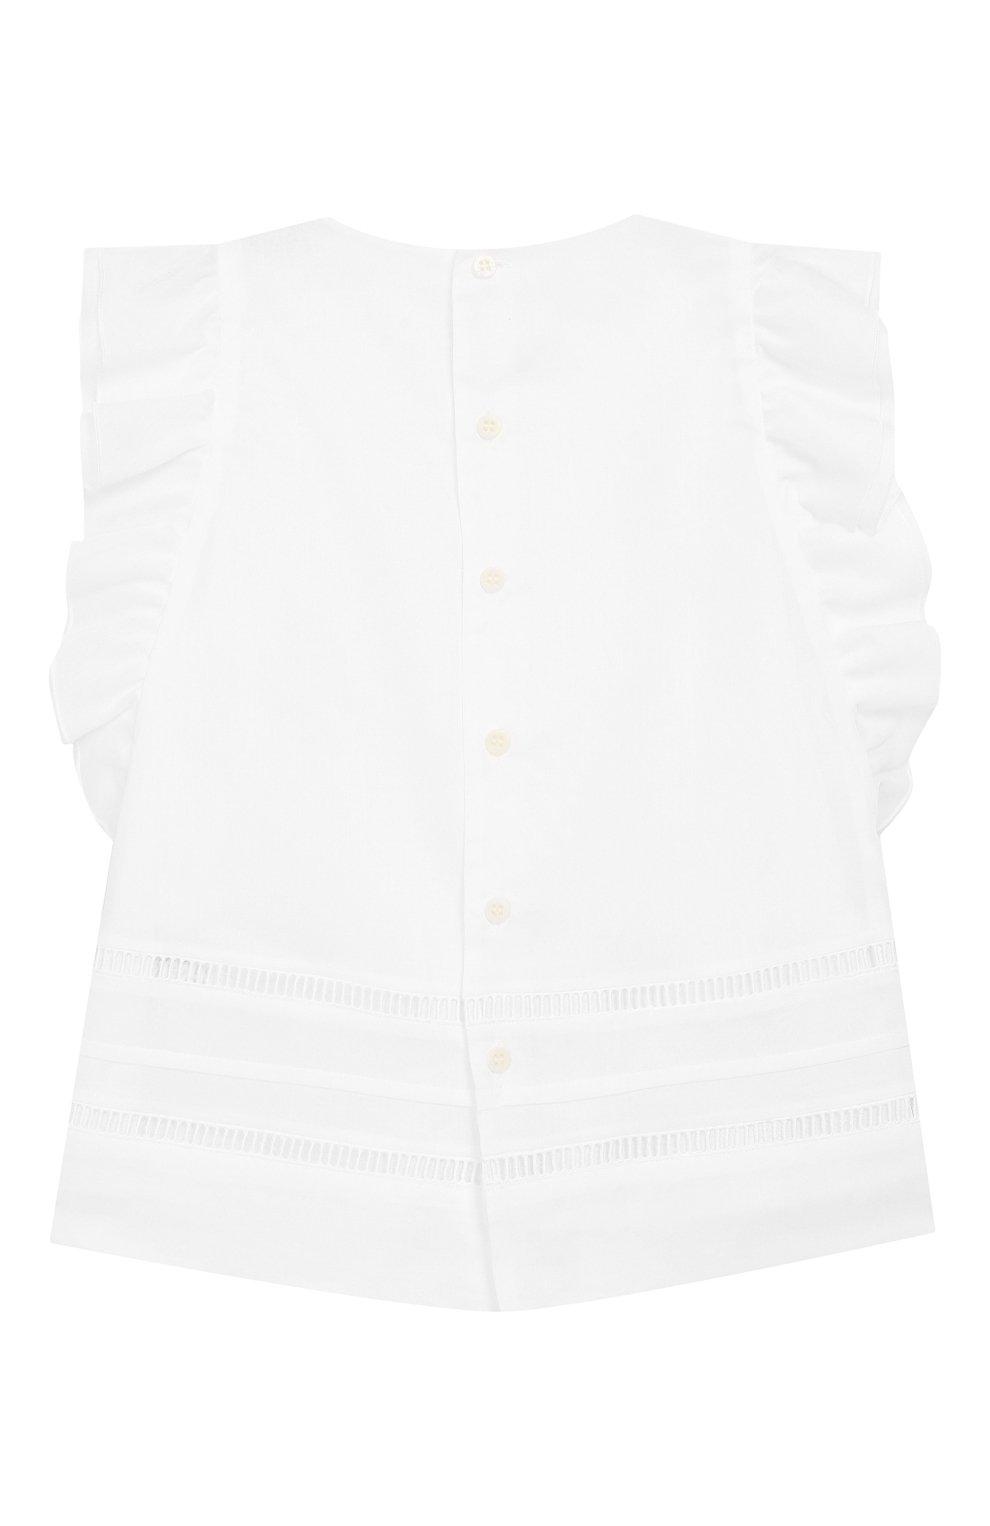 Хлопковая блузка без рукавов | Фото №2